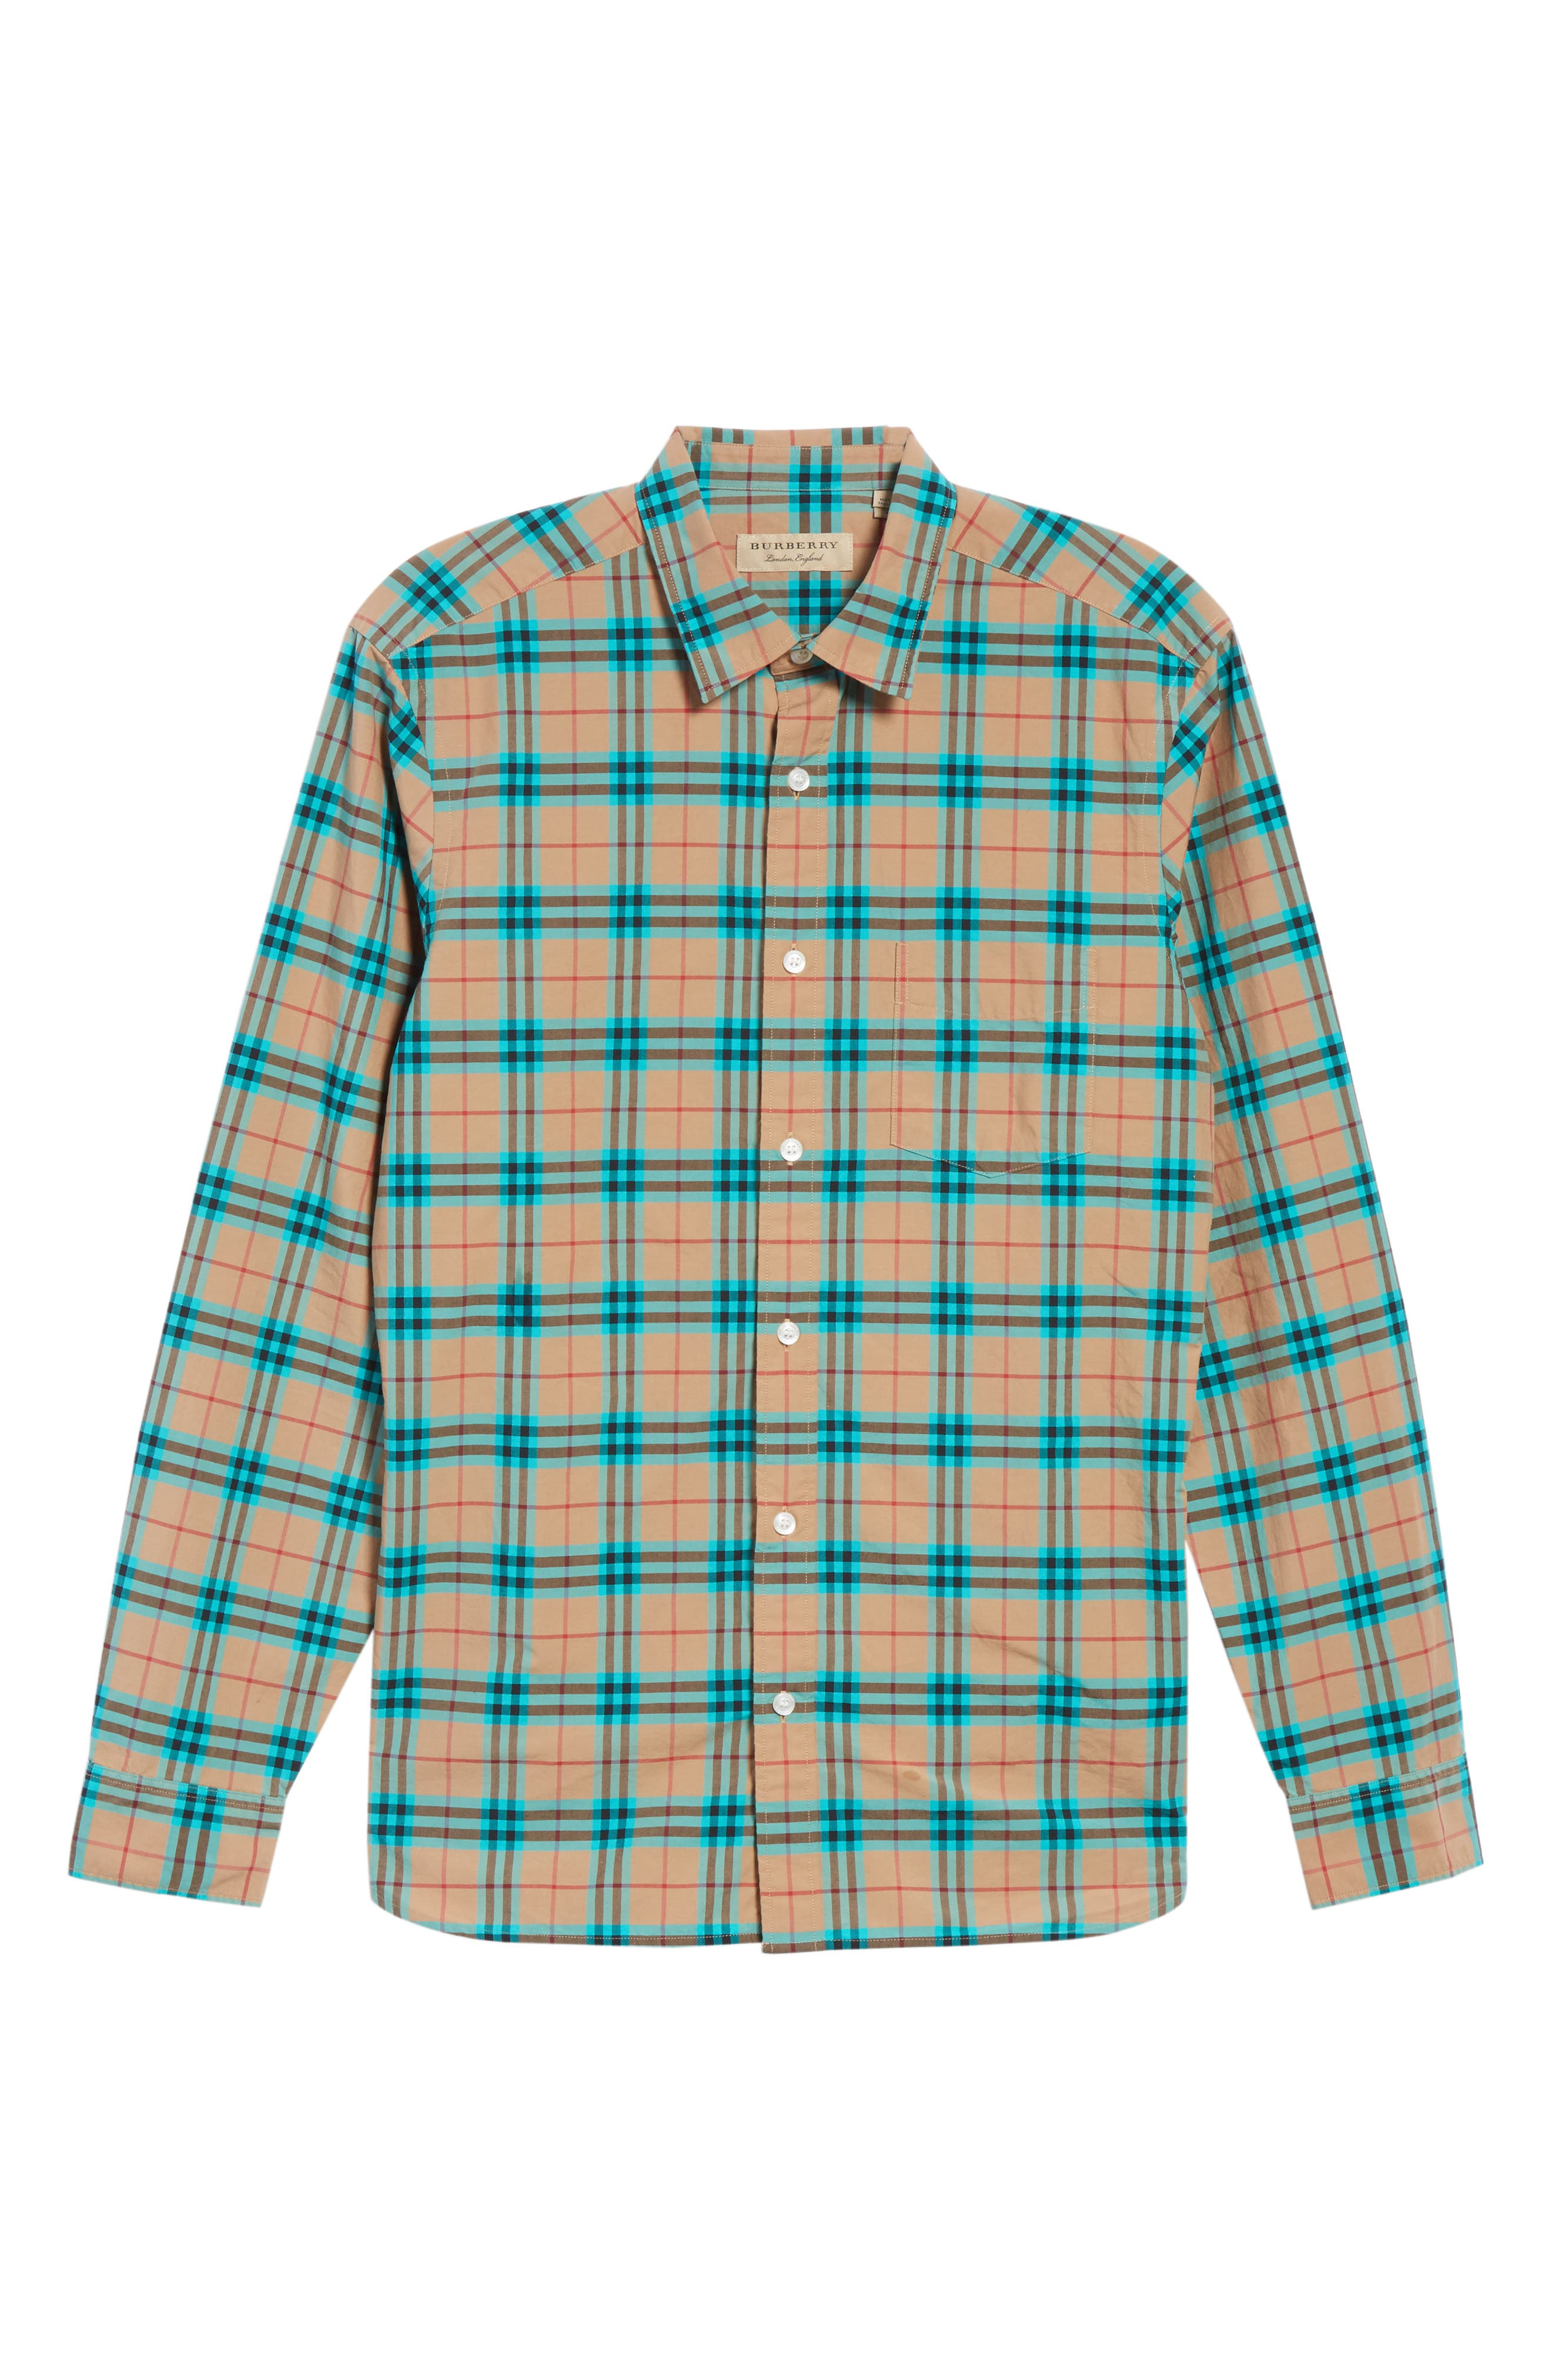 Alexander Check Sport Shirt,                             Alternate thumbnail 6, color,                             Aqua Green